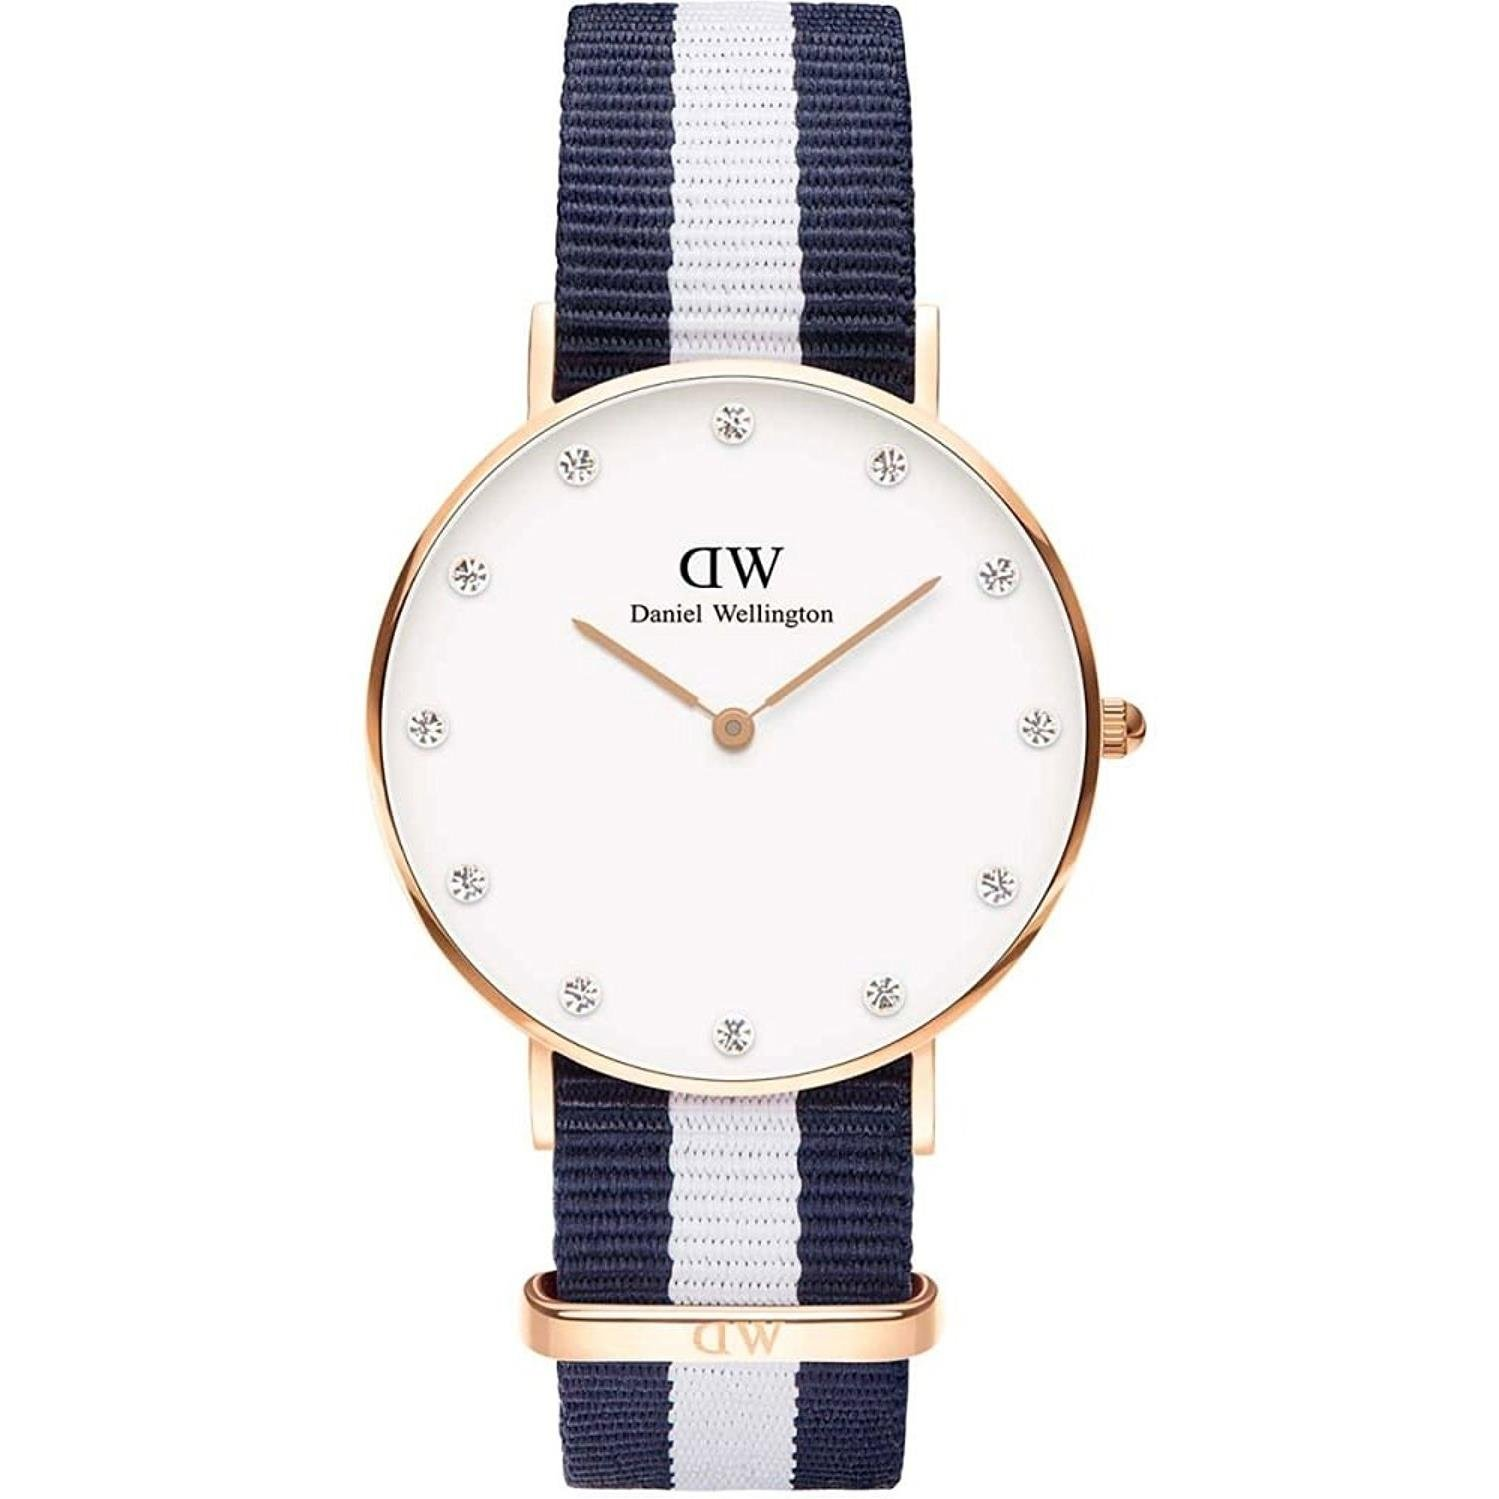 Daniel Wellington ダニエルウェリントン 腕時計 0953DW 34mm Classy Glasgow クラッシー グラスゴー Rose Gold ローズゴールド レディース [並行輸入品] B01BHRZWH0